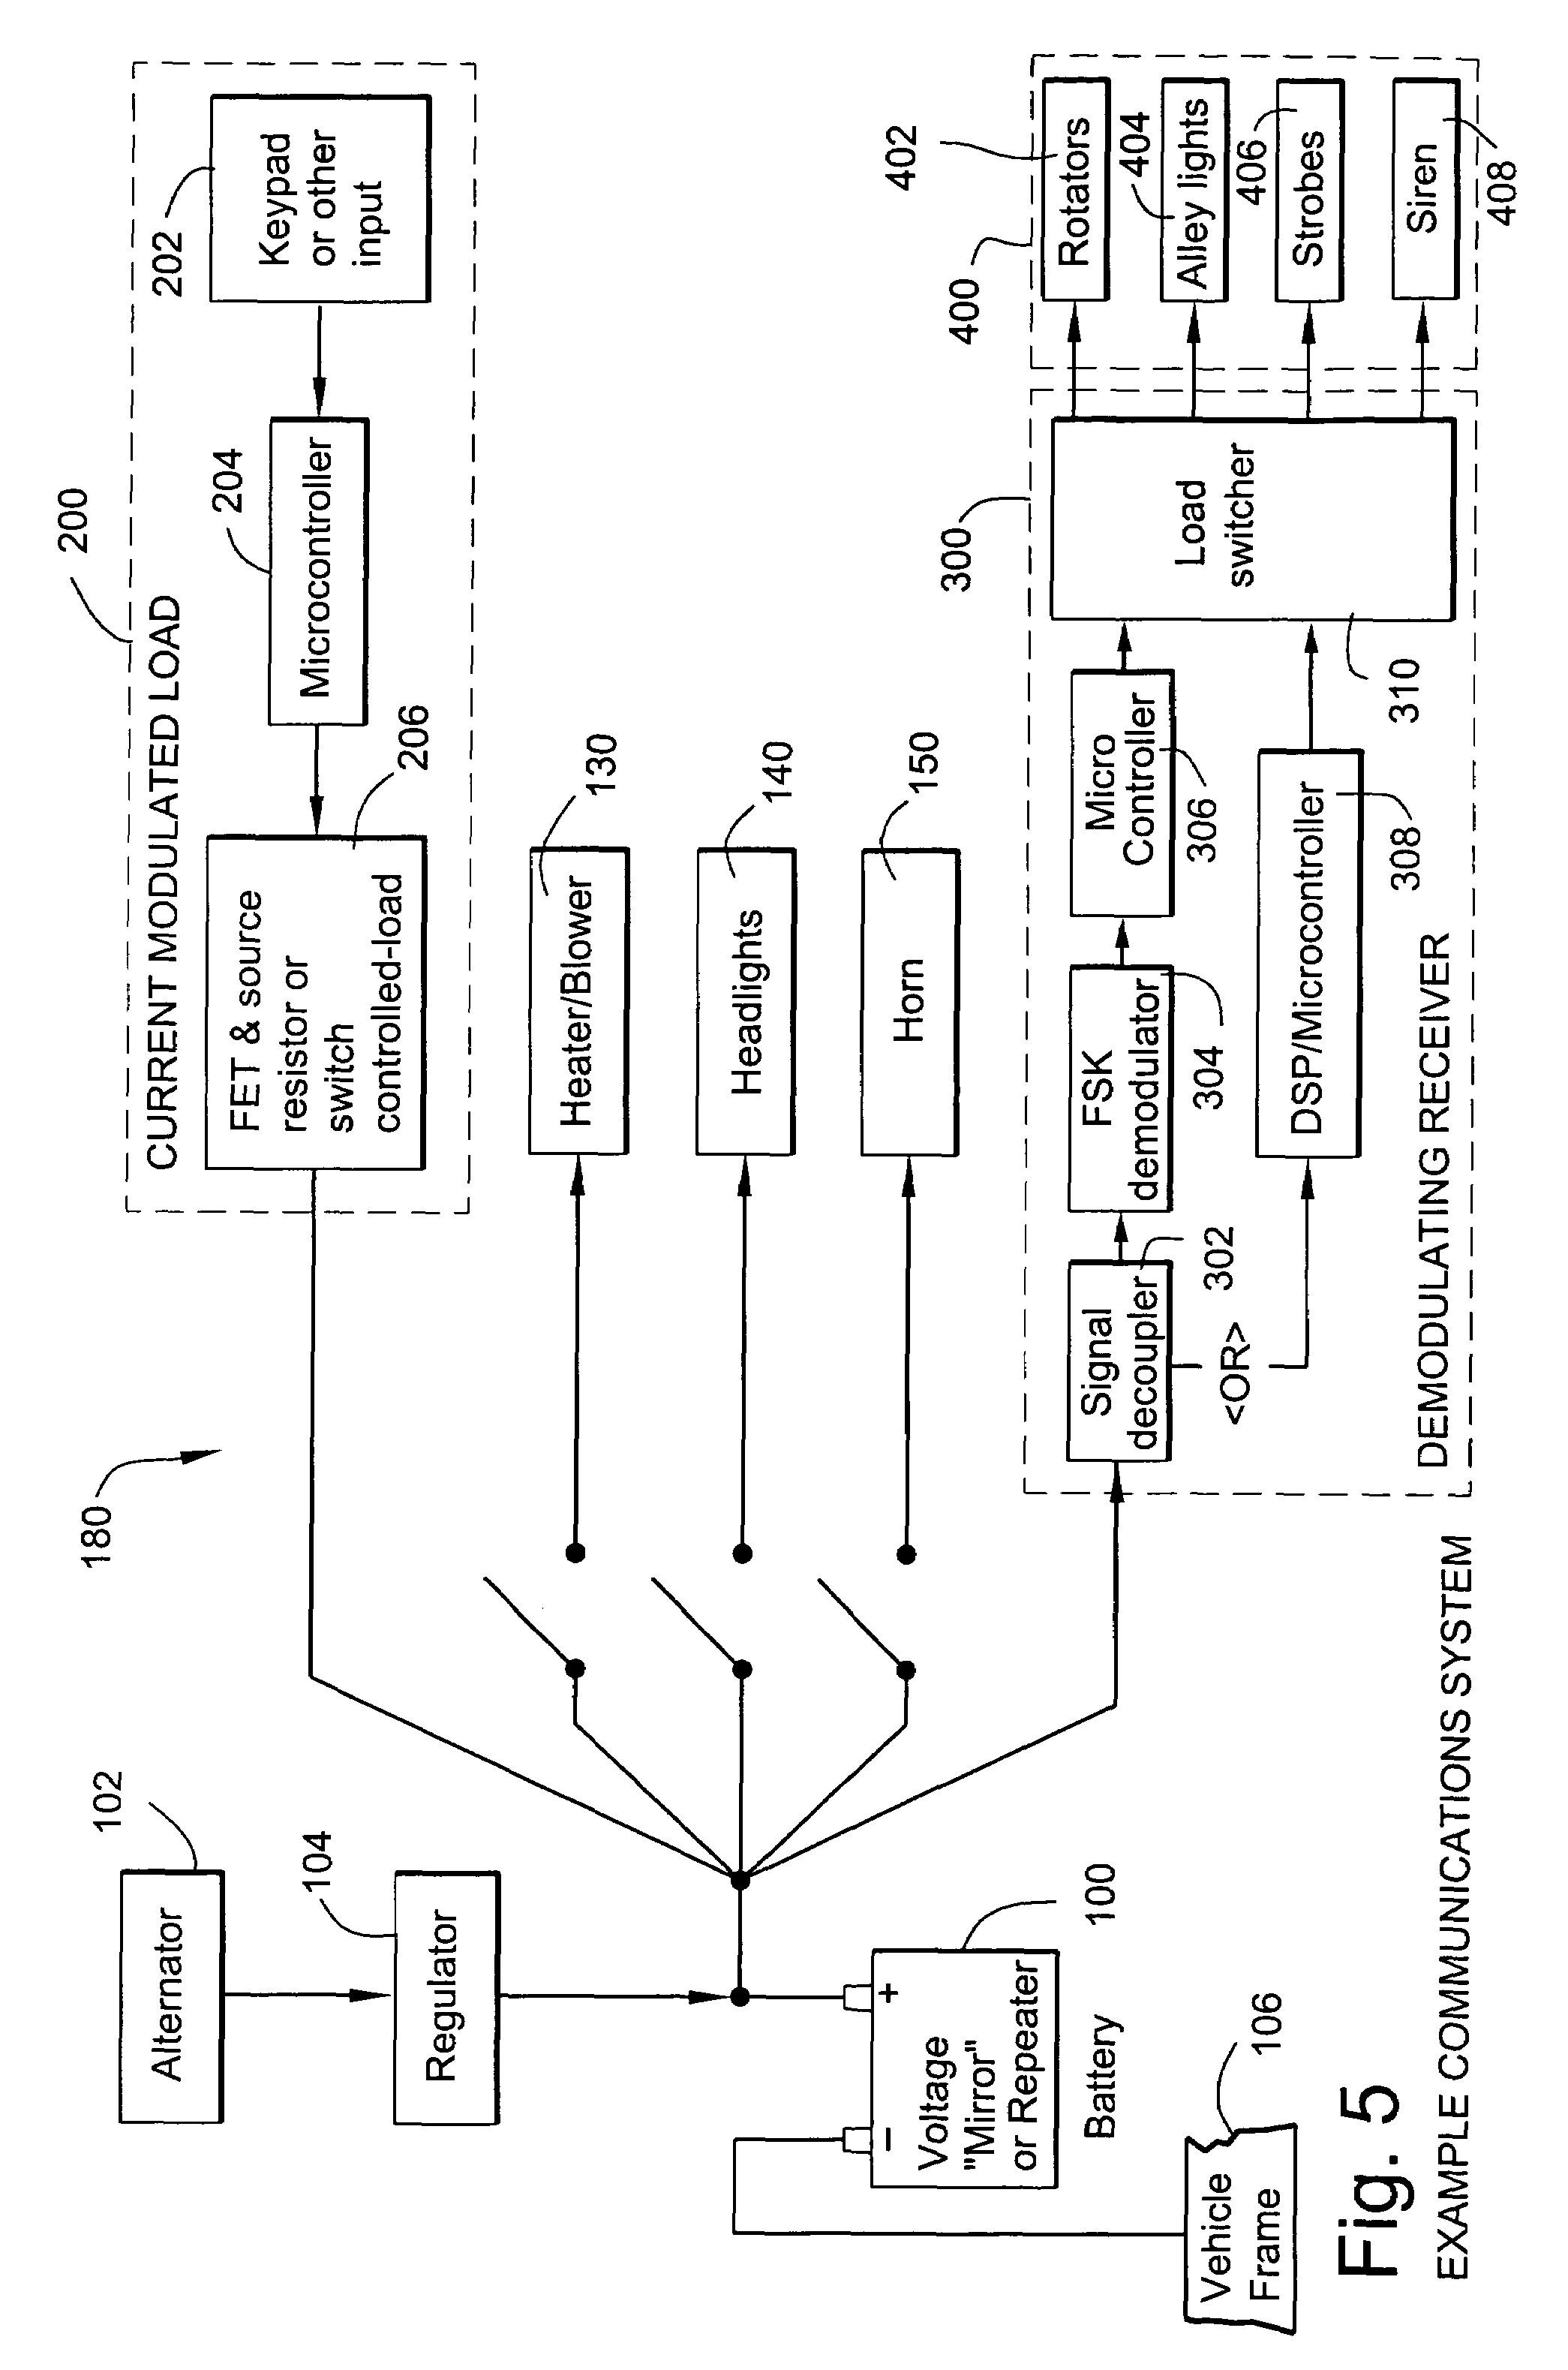 Code 3 Mx7000 Wiring Diagram